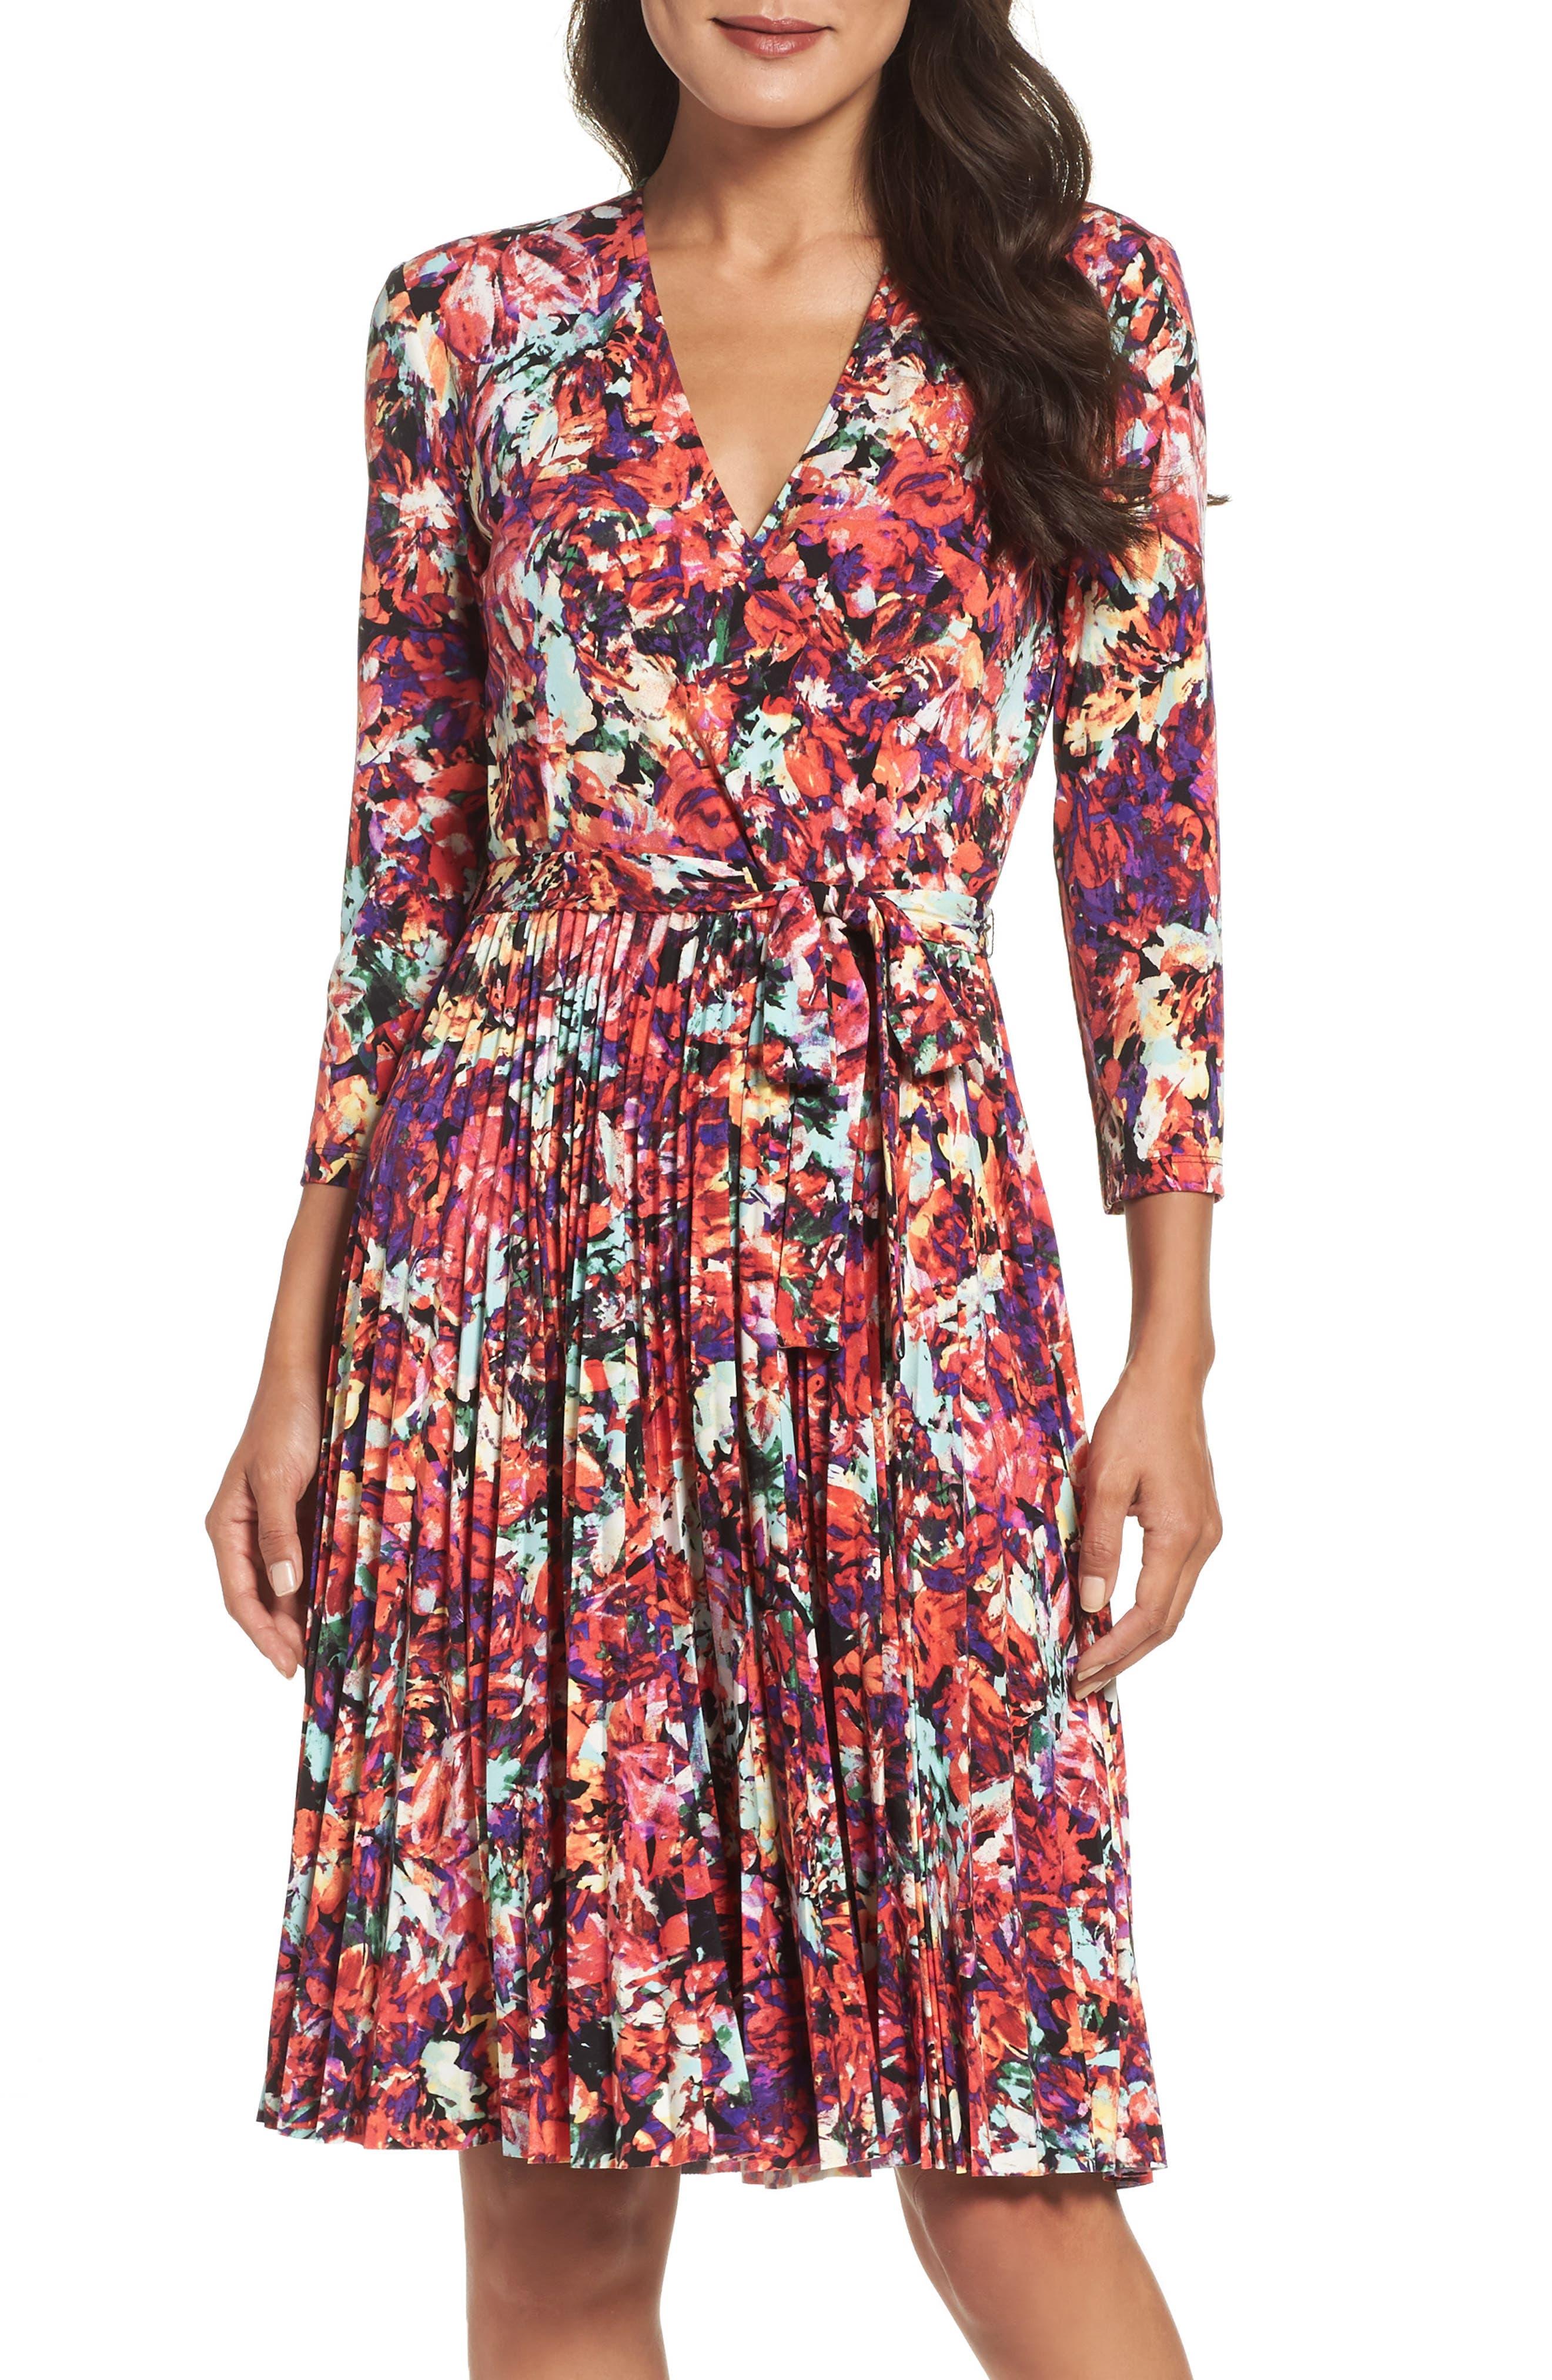 Main Image - Maggy London Print Fit & Flare Dress (Regular & Petite)